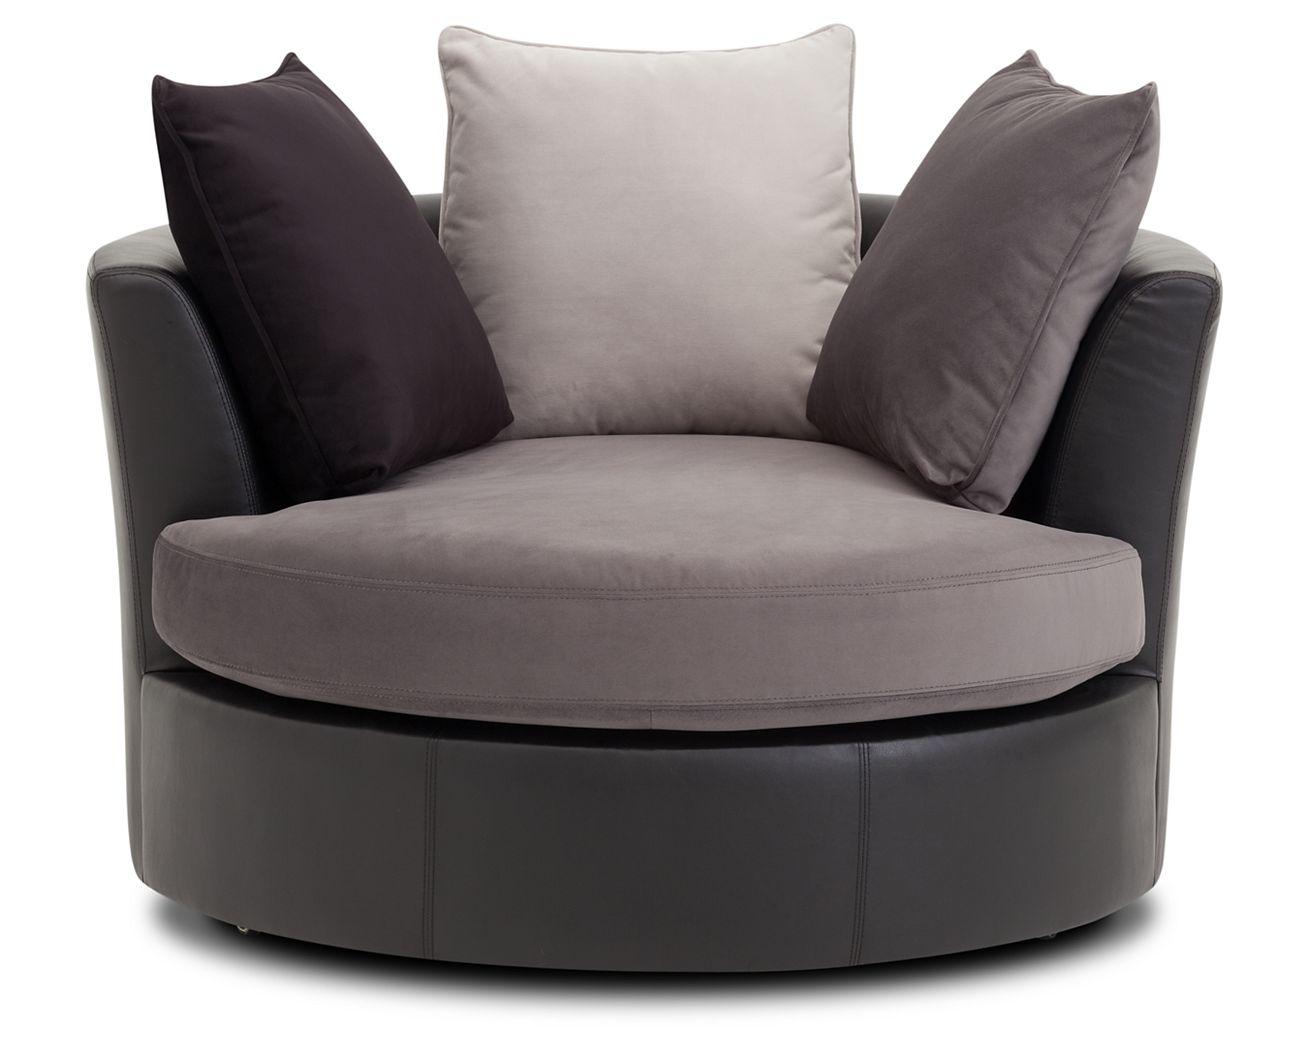 Vintage leather swivel chair - San Tropez Swivel Chair